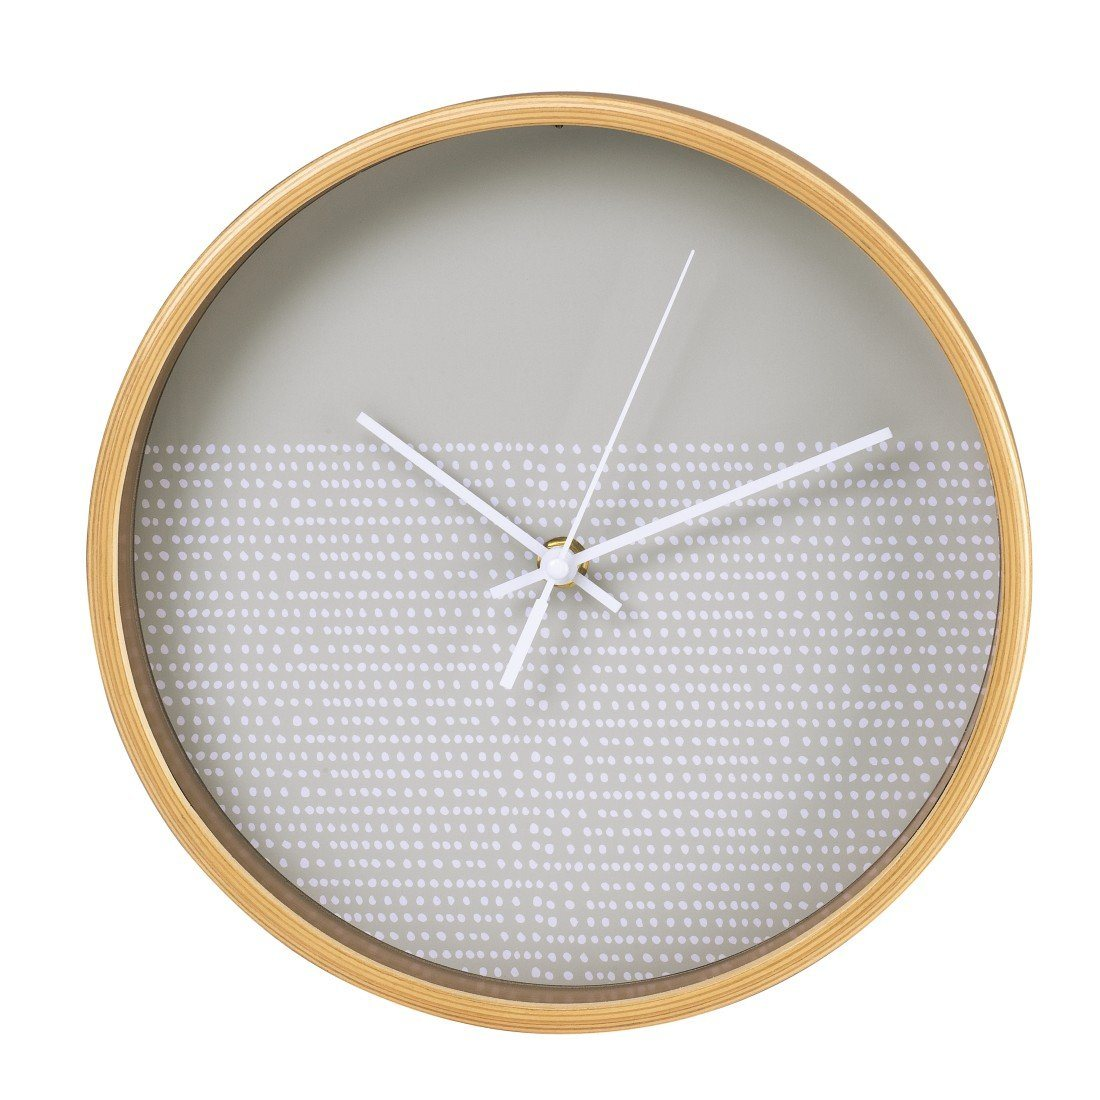 Hama Wanduhr geräuscharme Uhr ohne Ticken, leis...